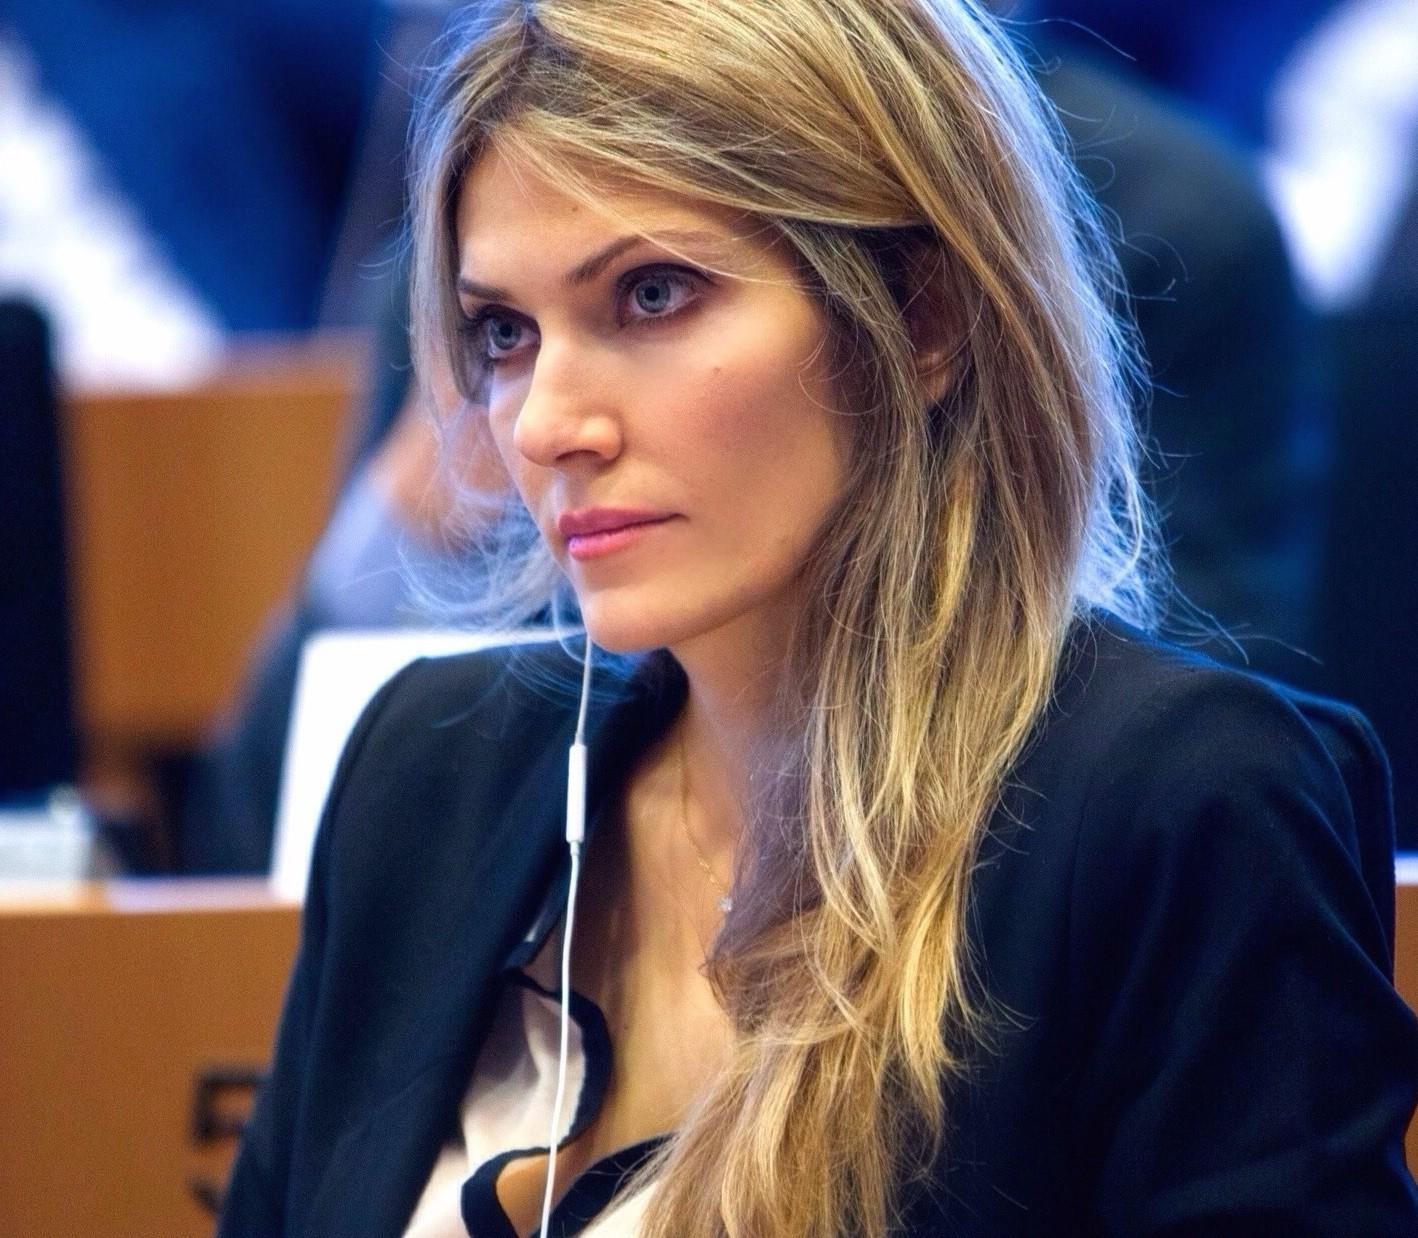 Член Европейского парламента о позиции ЕС в отношении цифровых активов